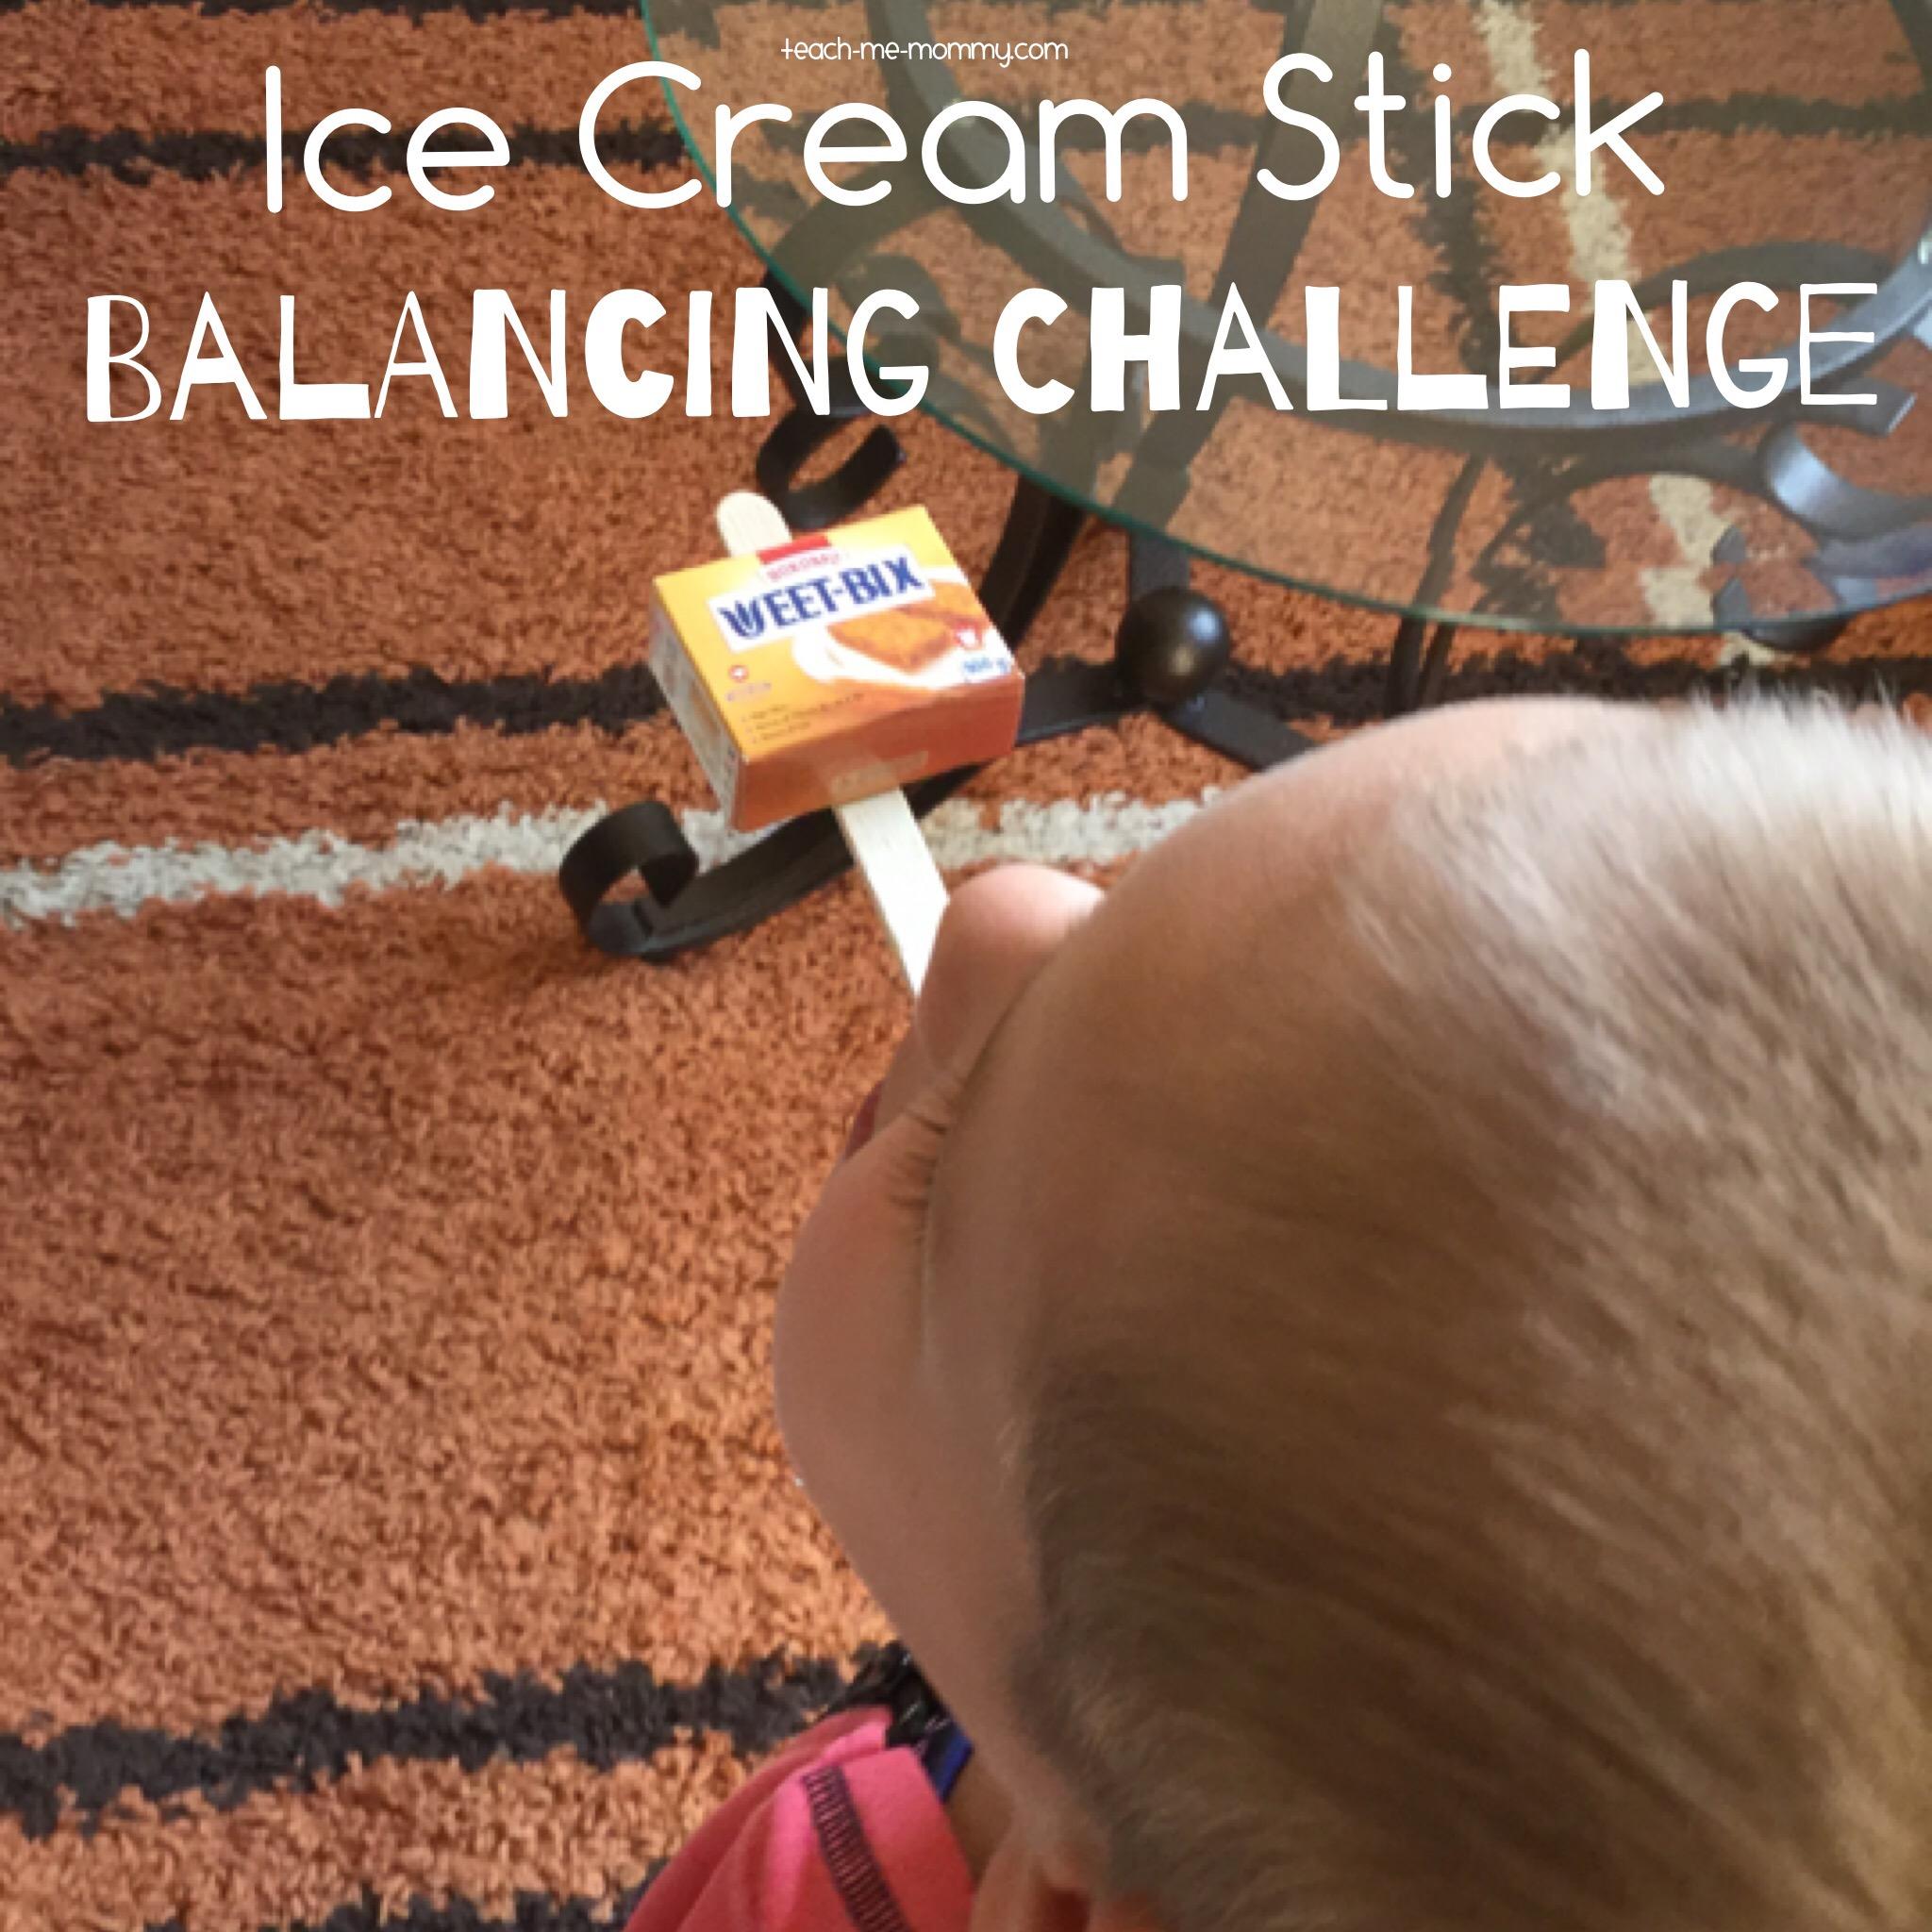 Stick Challenge